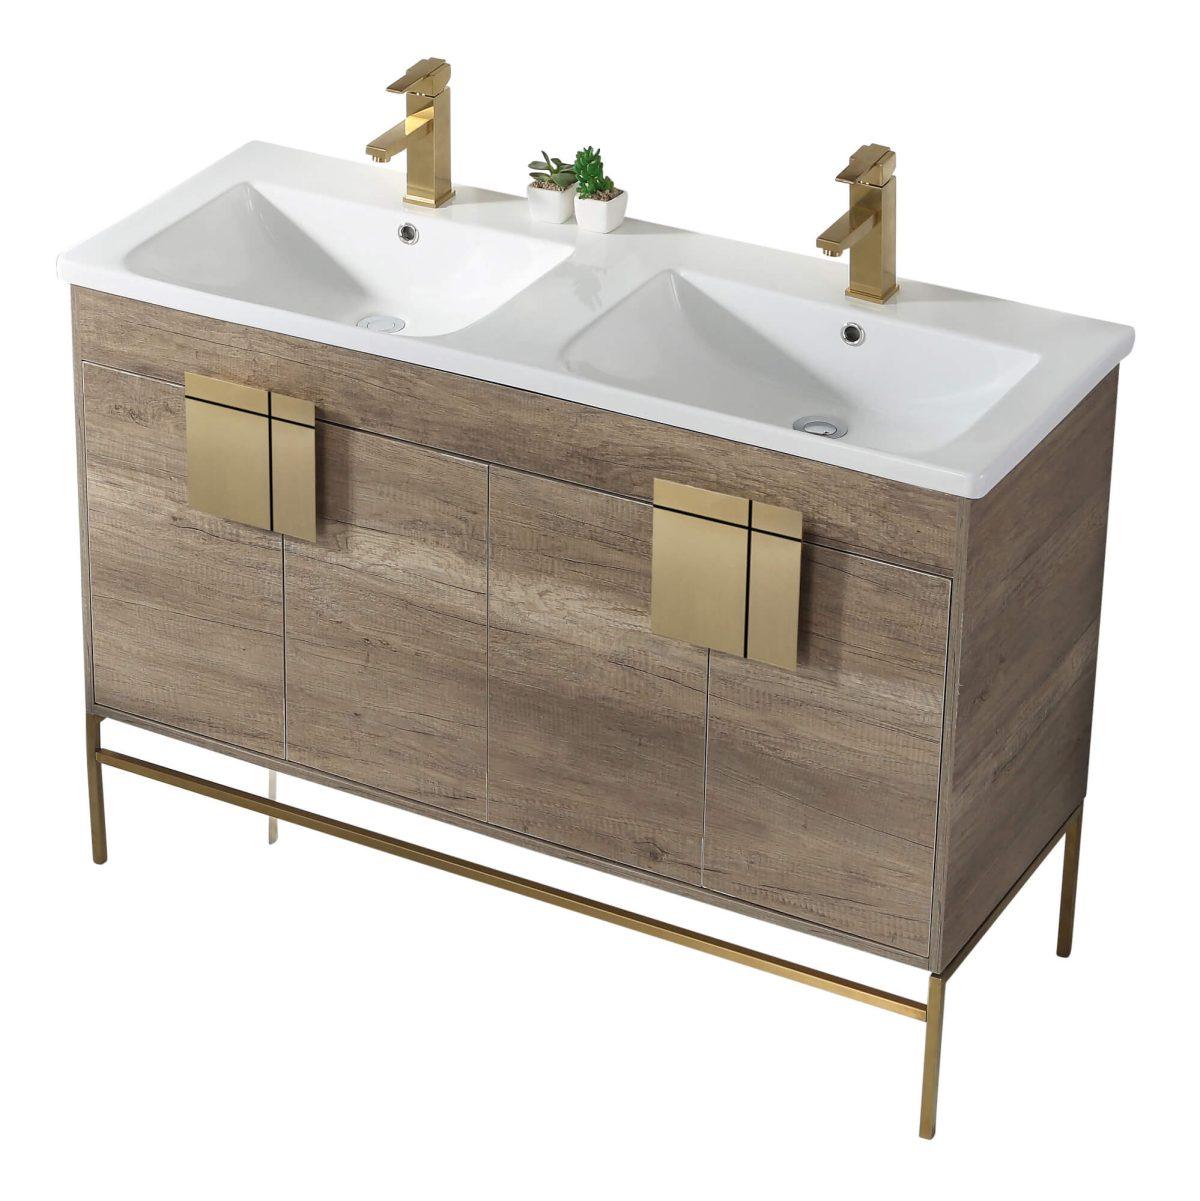 "Shawbridge 48"" Modern Double Bathroom Vanity  Shadow Gray with Satin Brass Hardware"